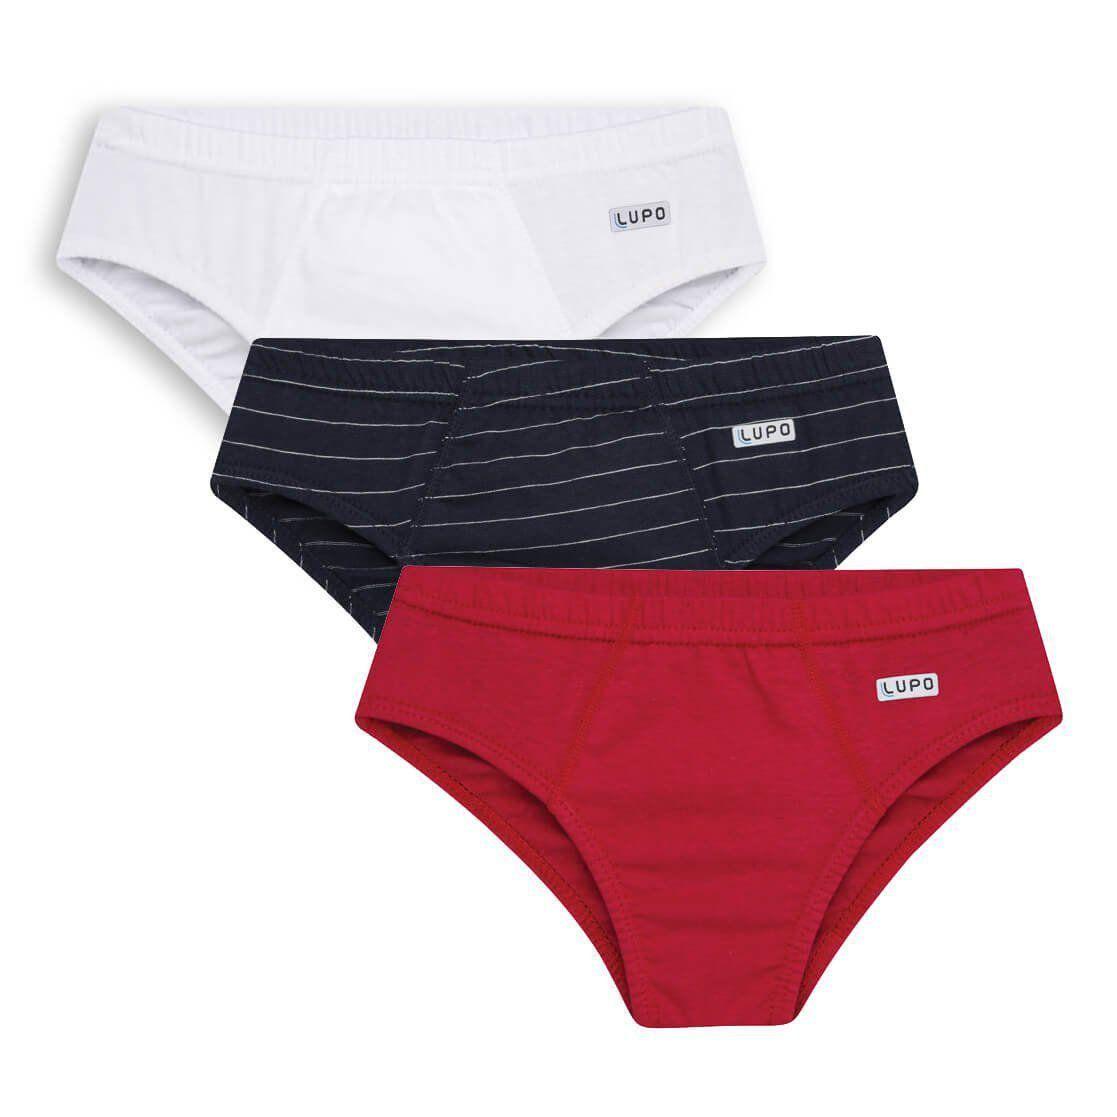 Cueca Infantil Slip Kit 3 cuecas Vermelha Lupo